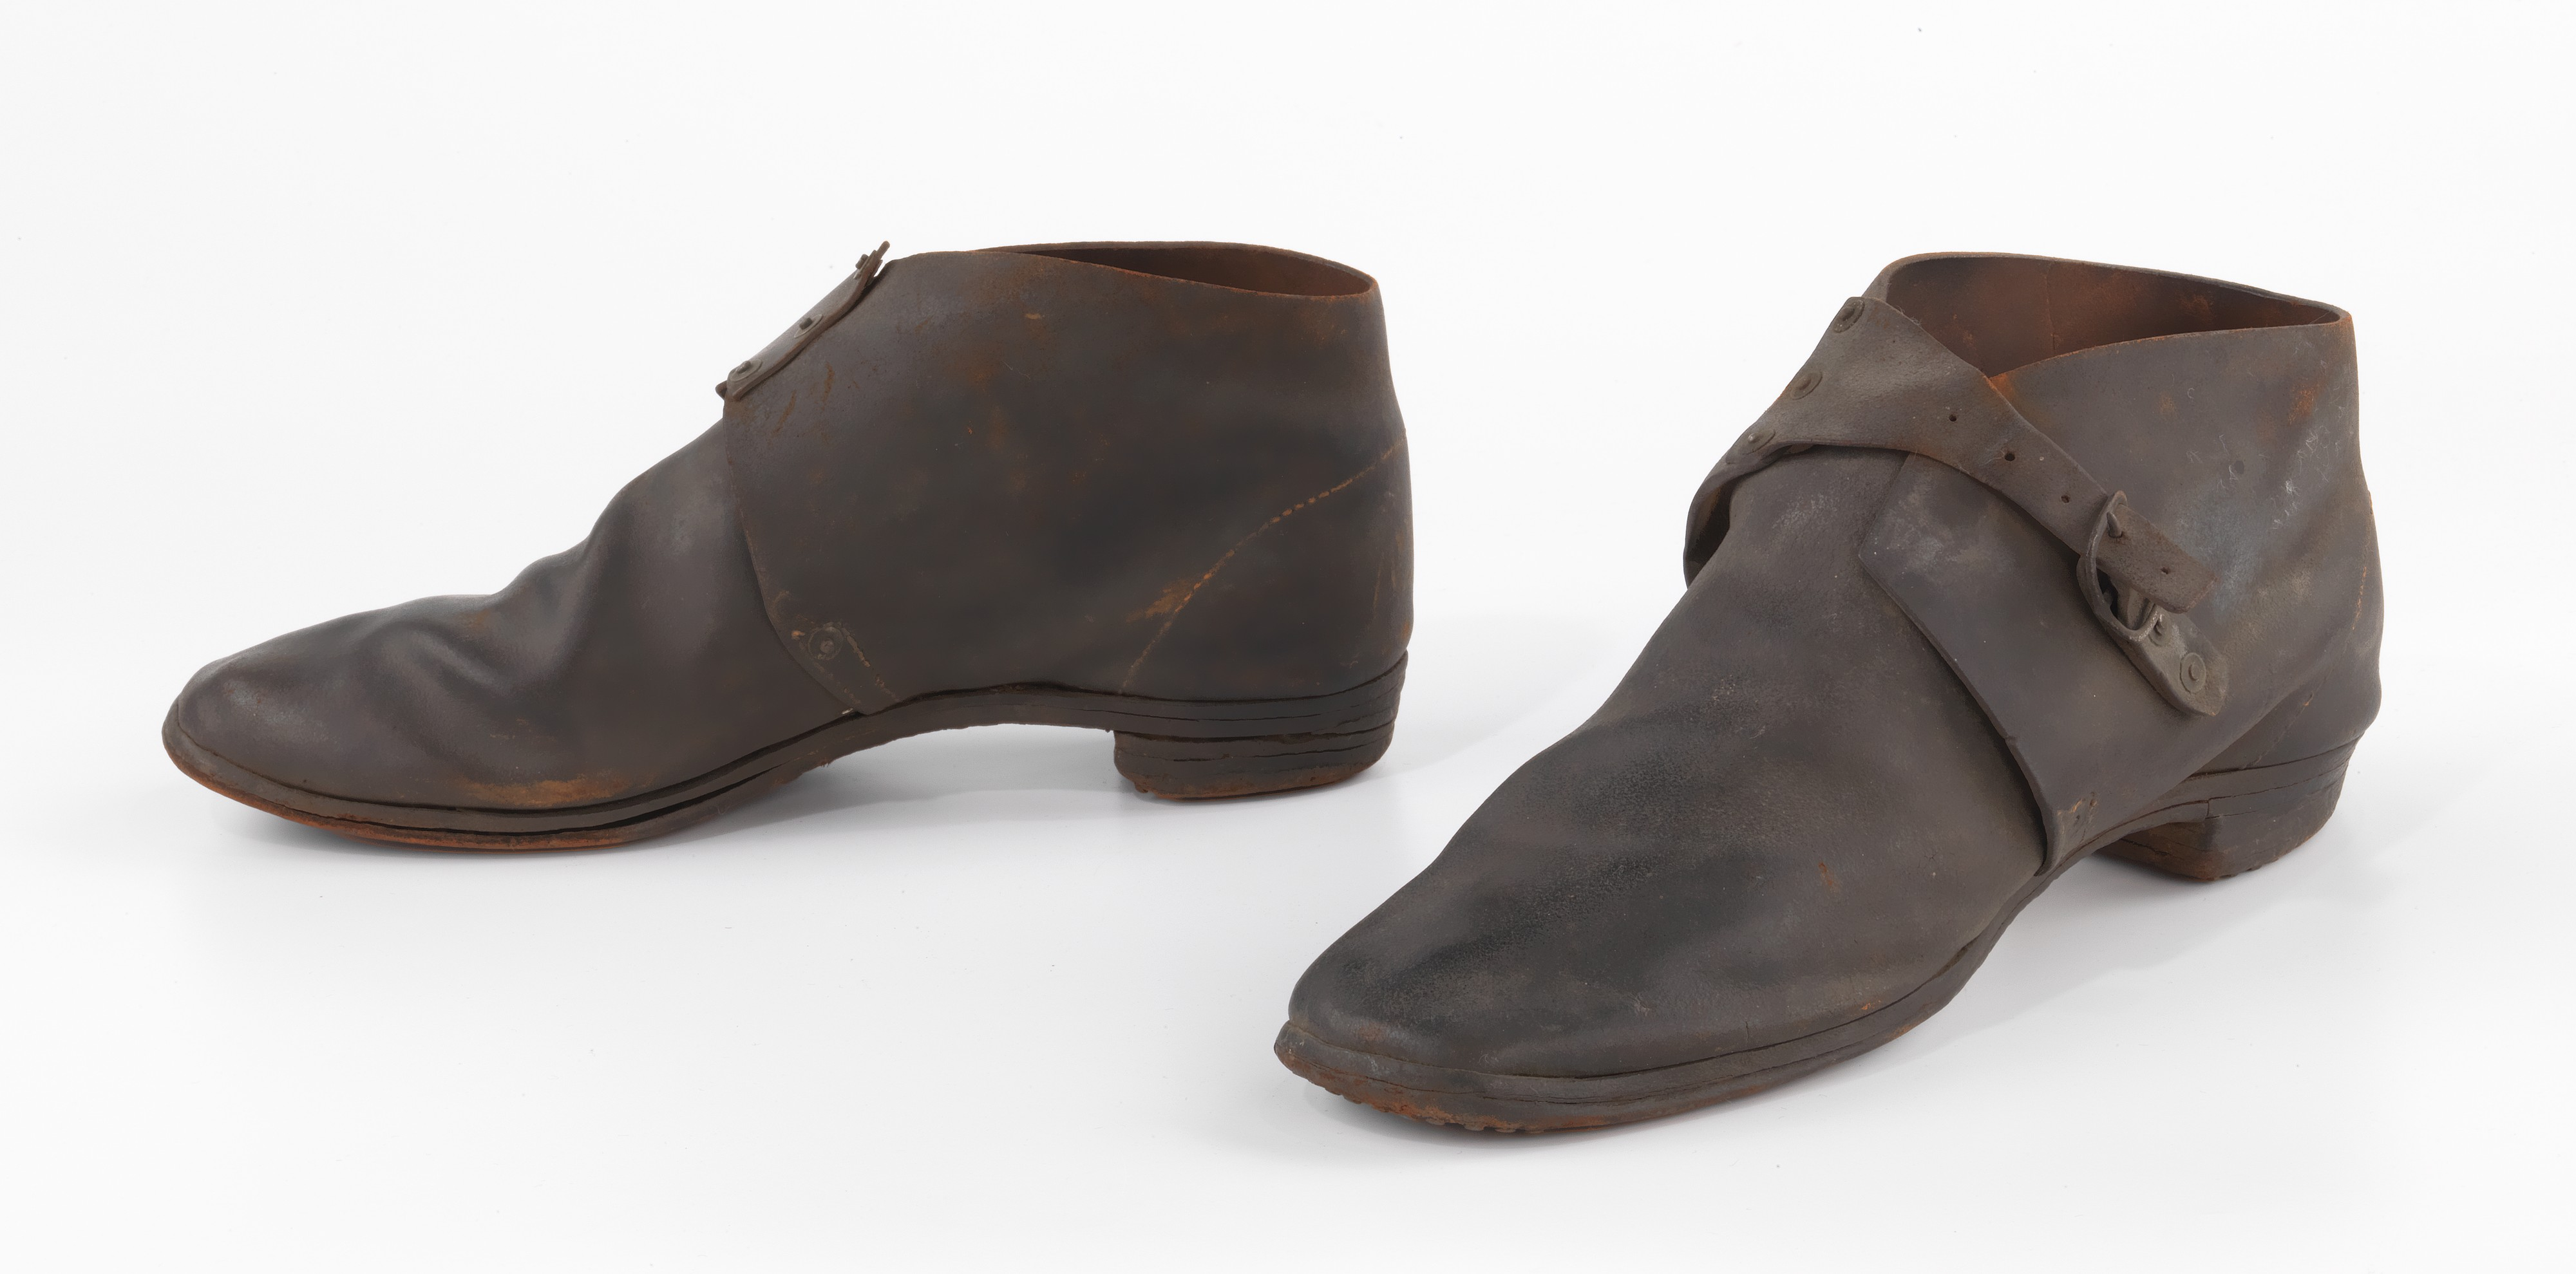 Revolutionary War Boots